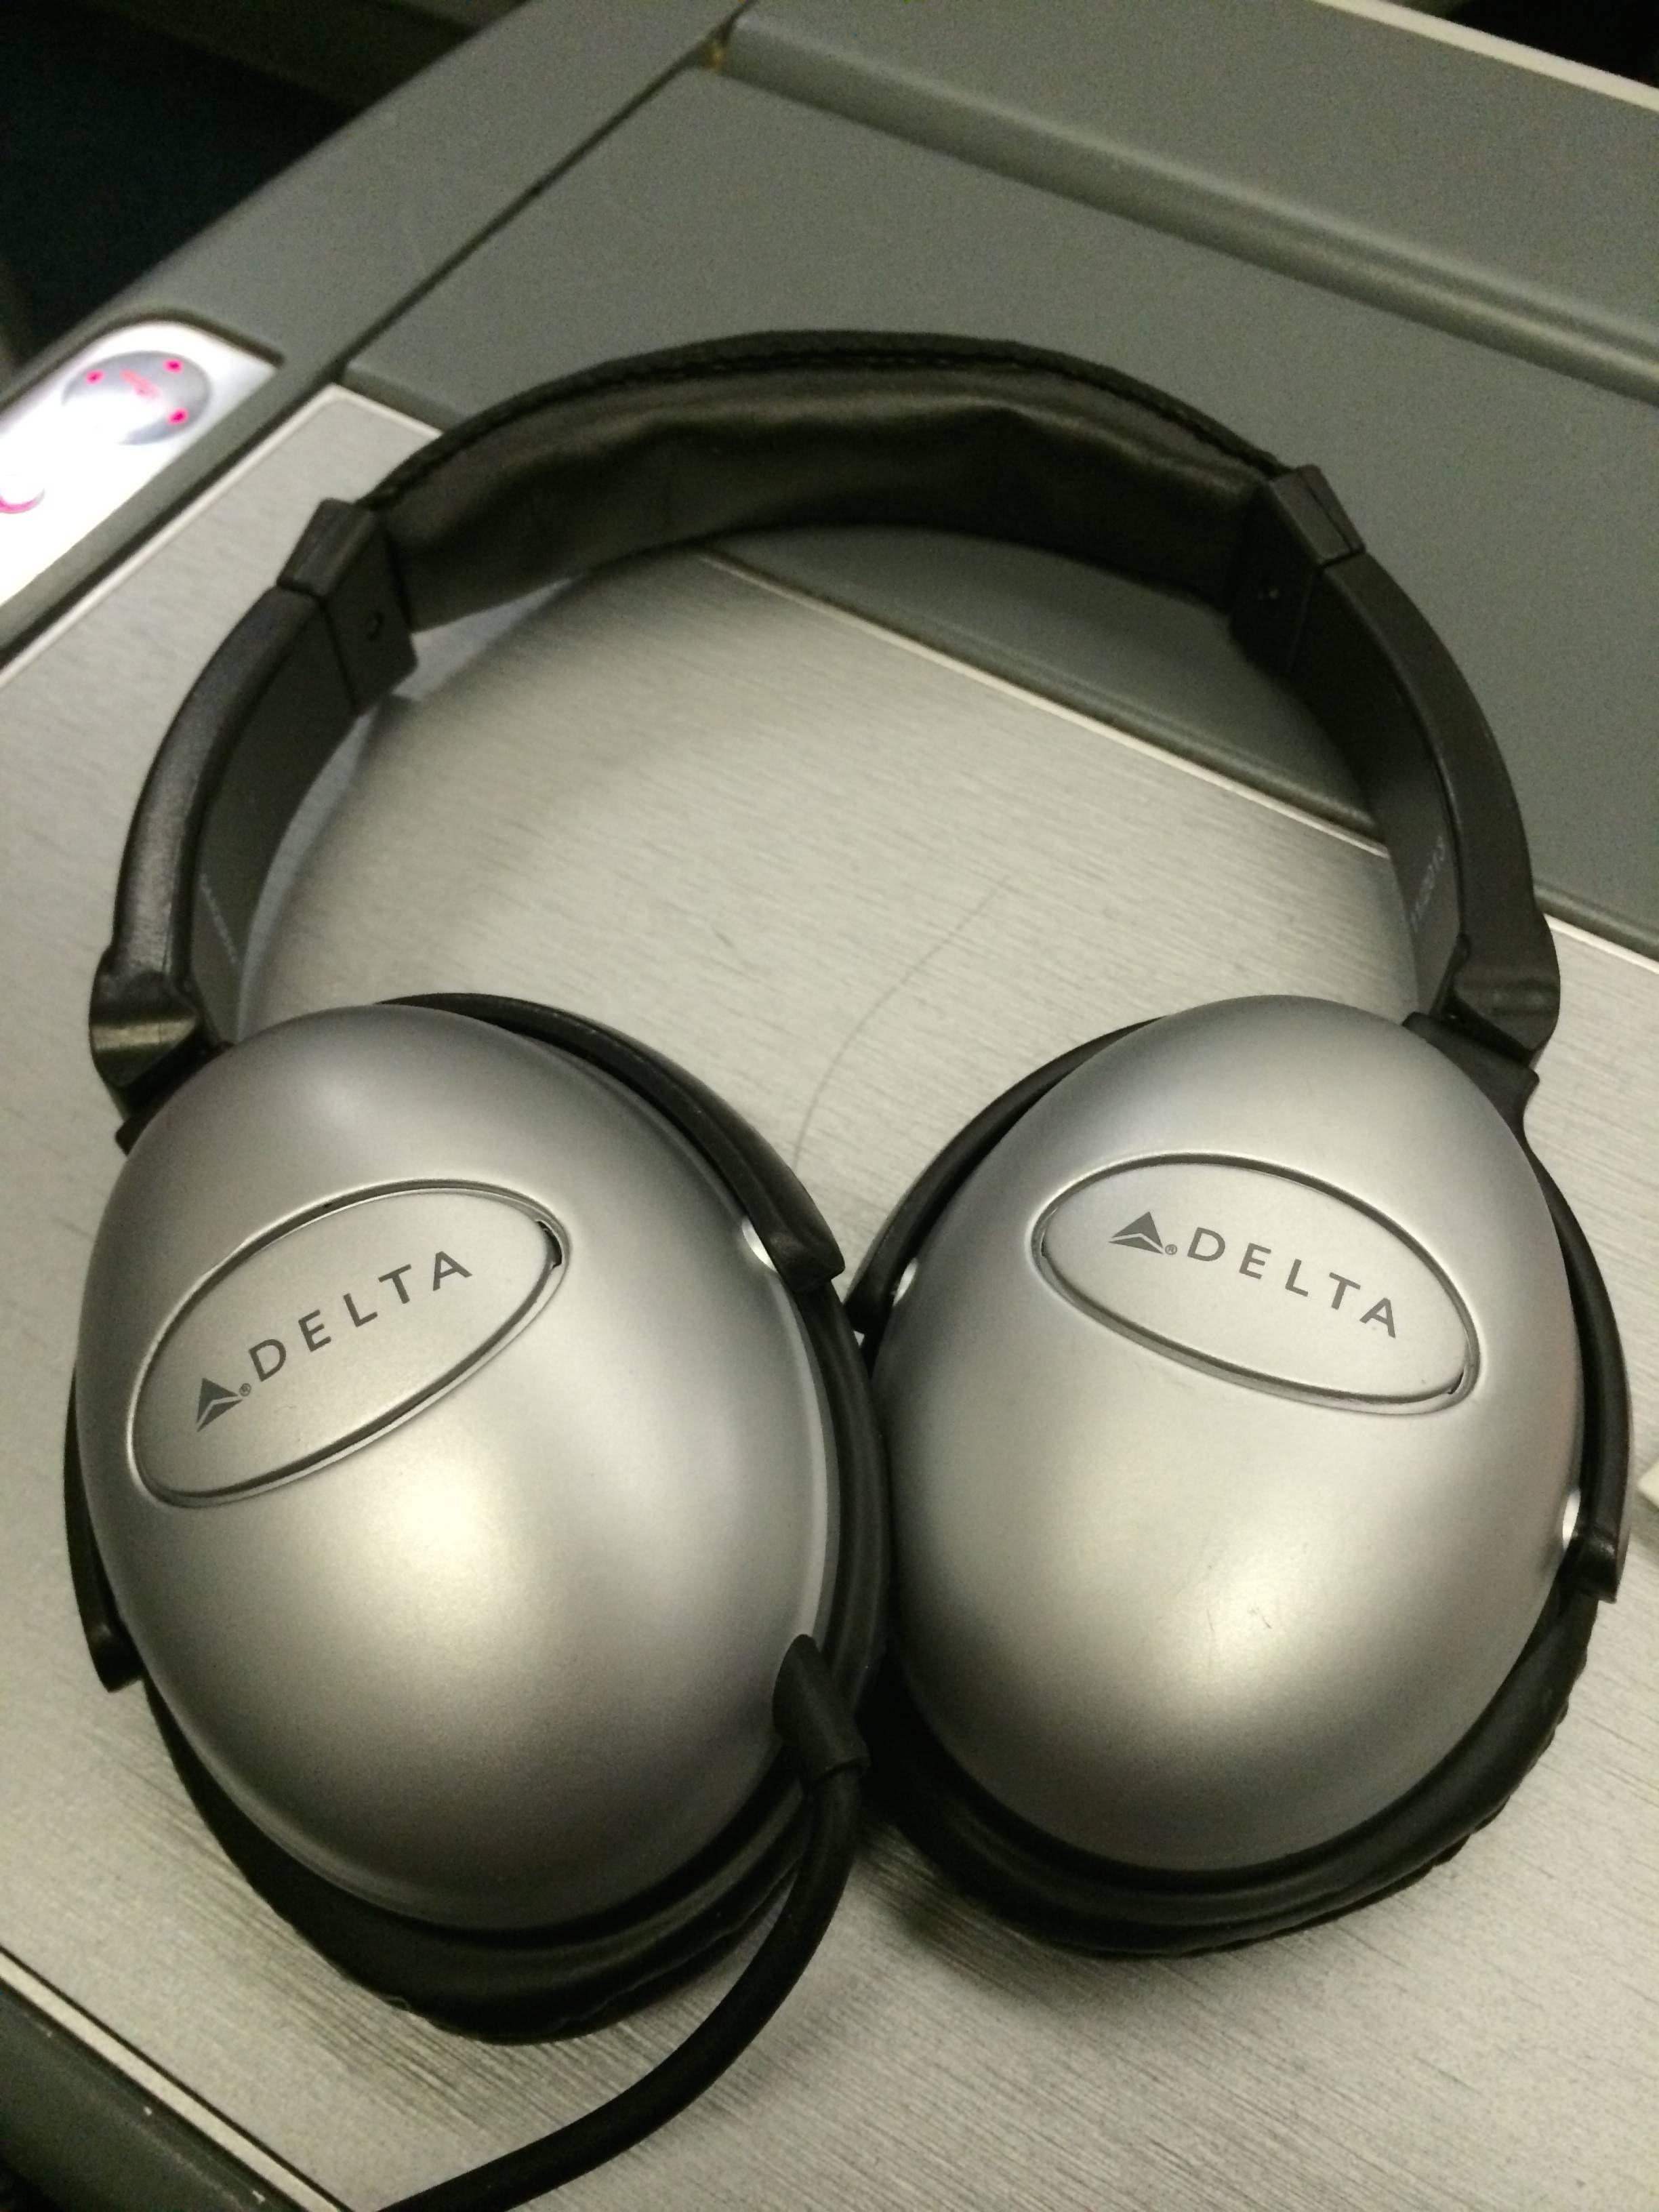 Delta Business Elite B767-400ER Executiva - passageirodeprimeira